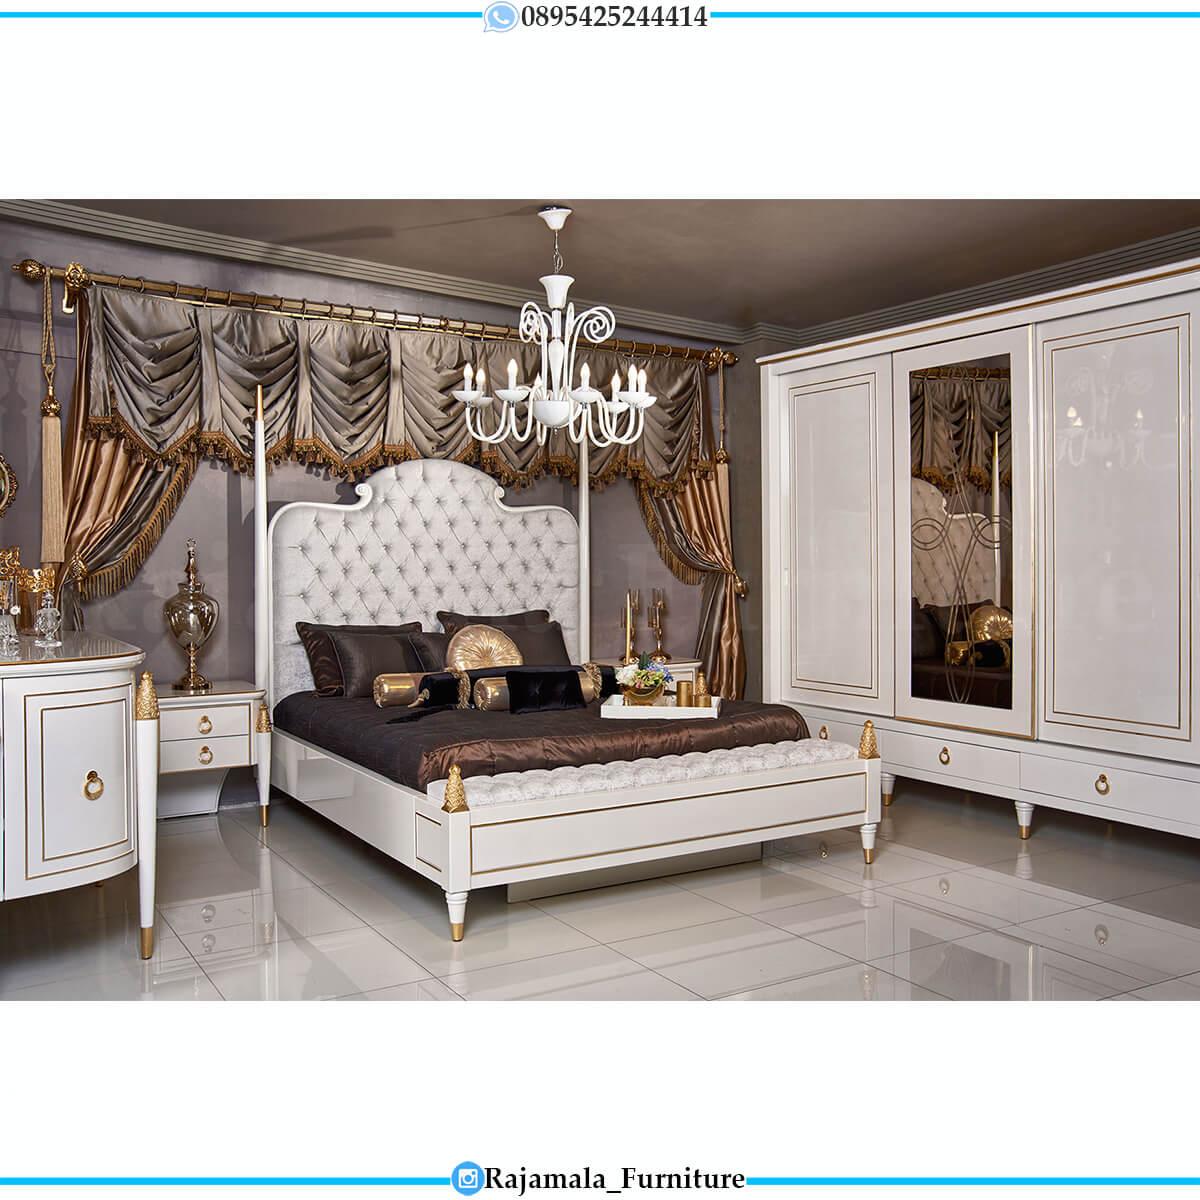 Tempat Tidur Mewah Putih Duco Luxurious Art Deco Design RM-0708